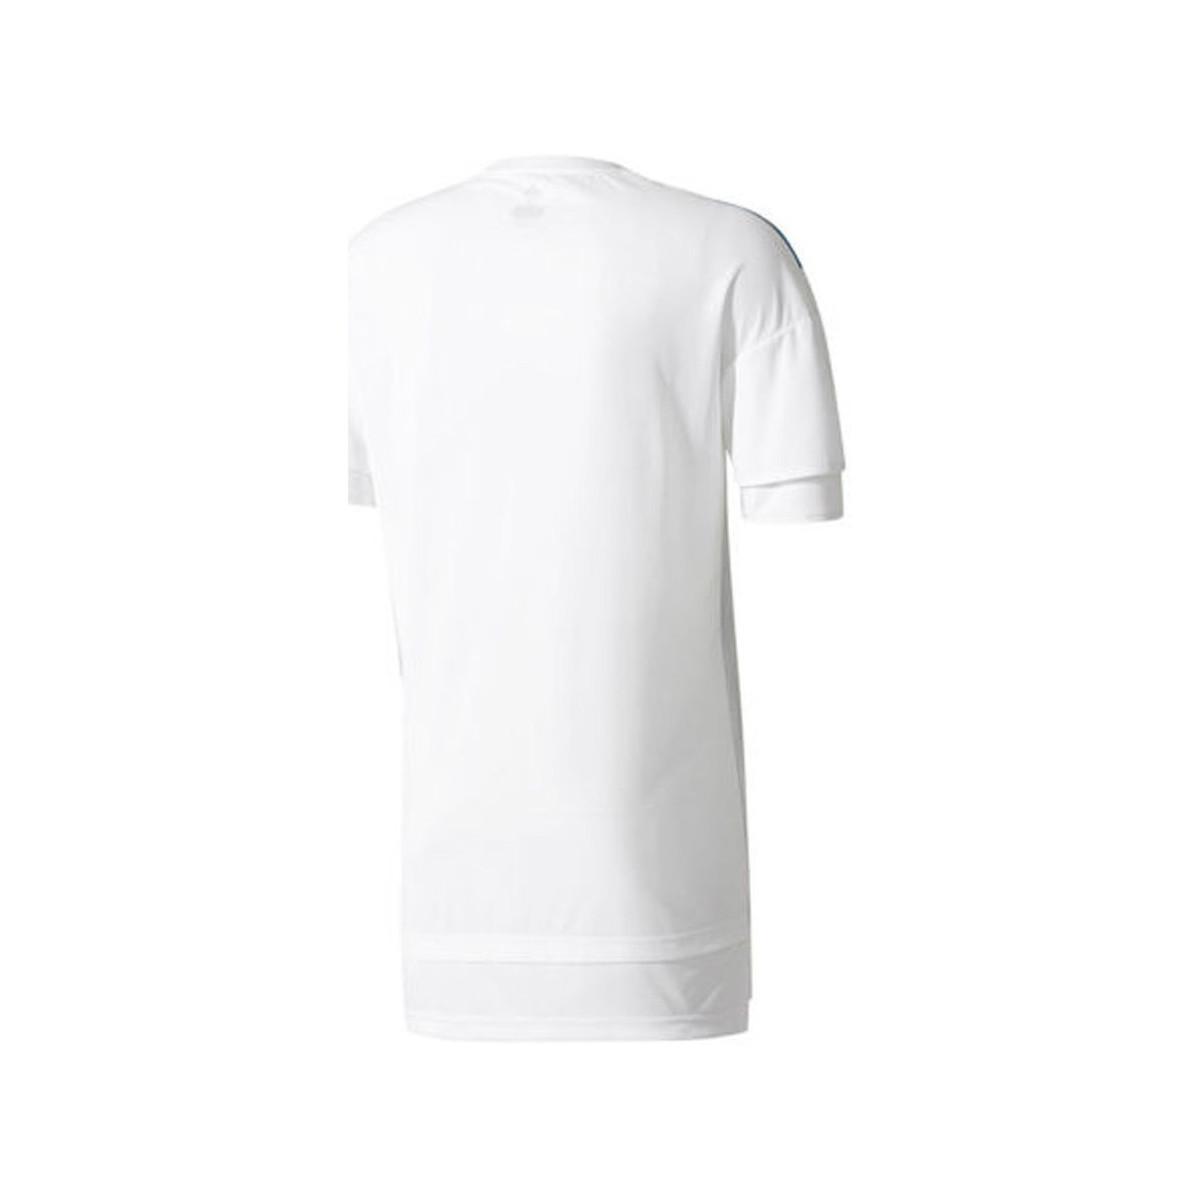 99cf1ffc5 Adidas - 2017-2018 Real Madrid Pre-match Training Shirt Men s T Shirt In.  View fullscreen